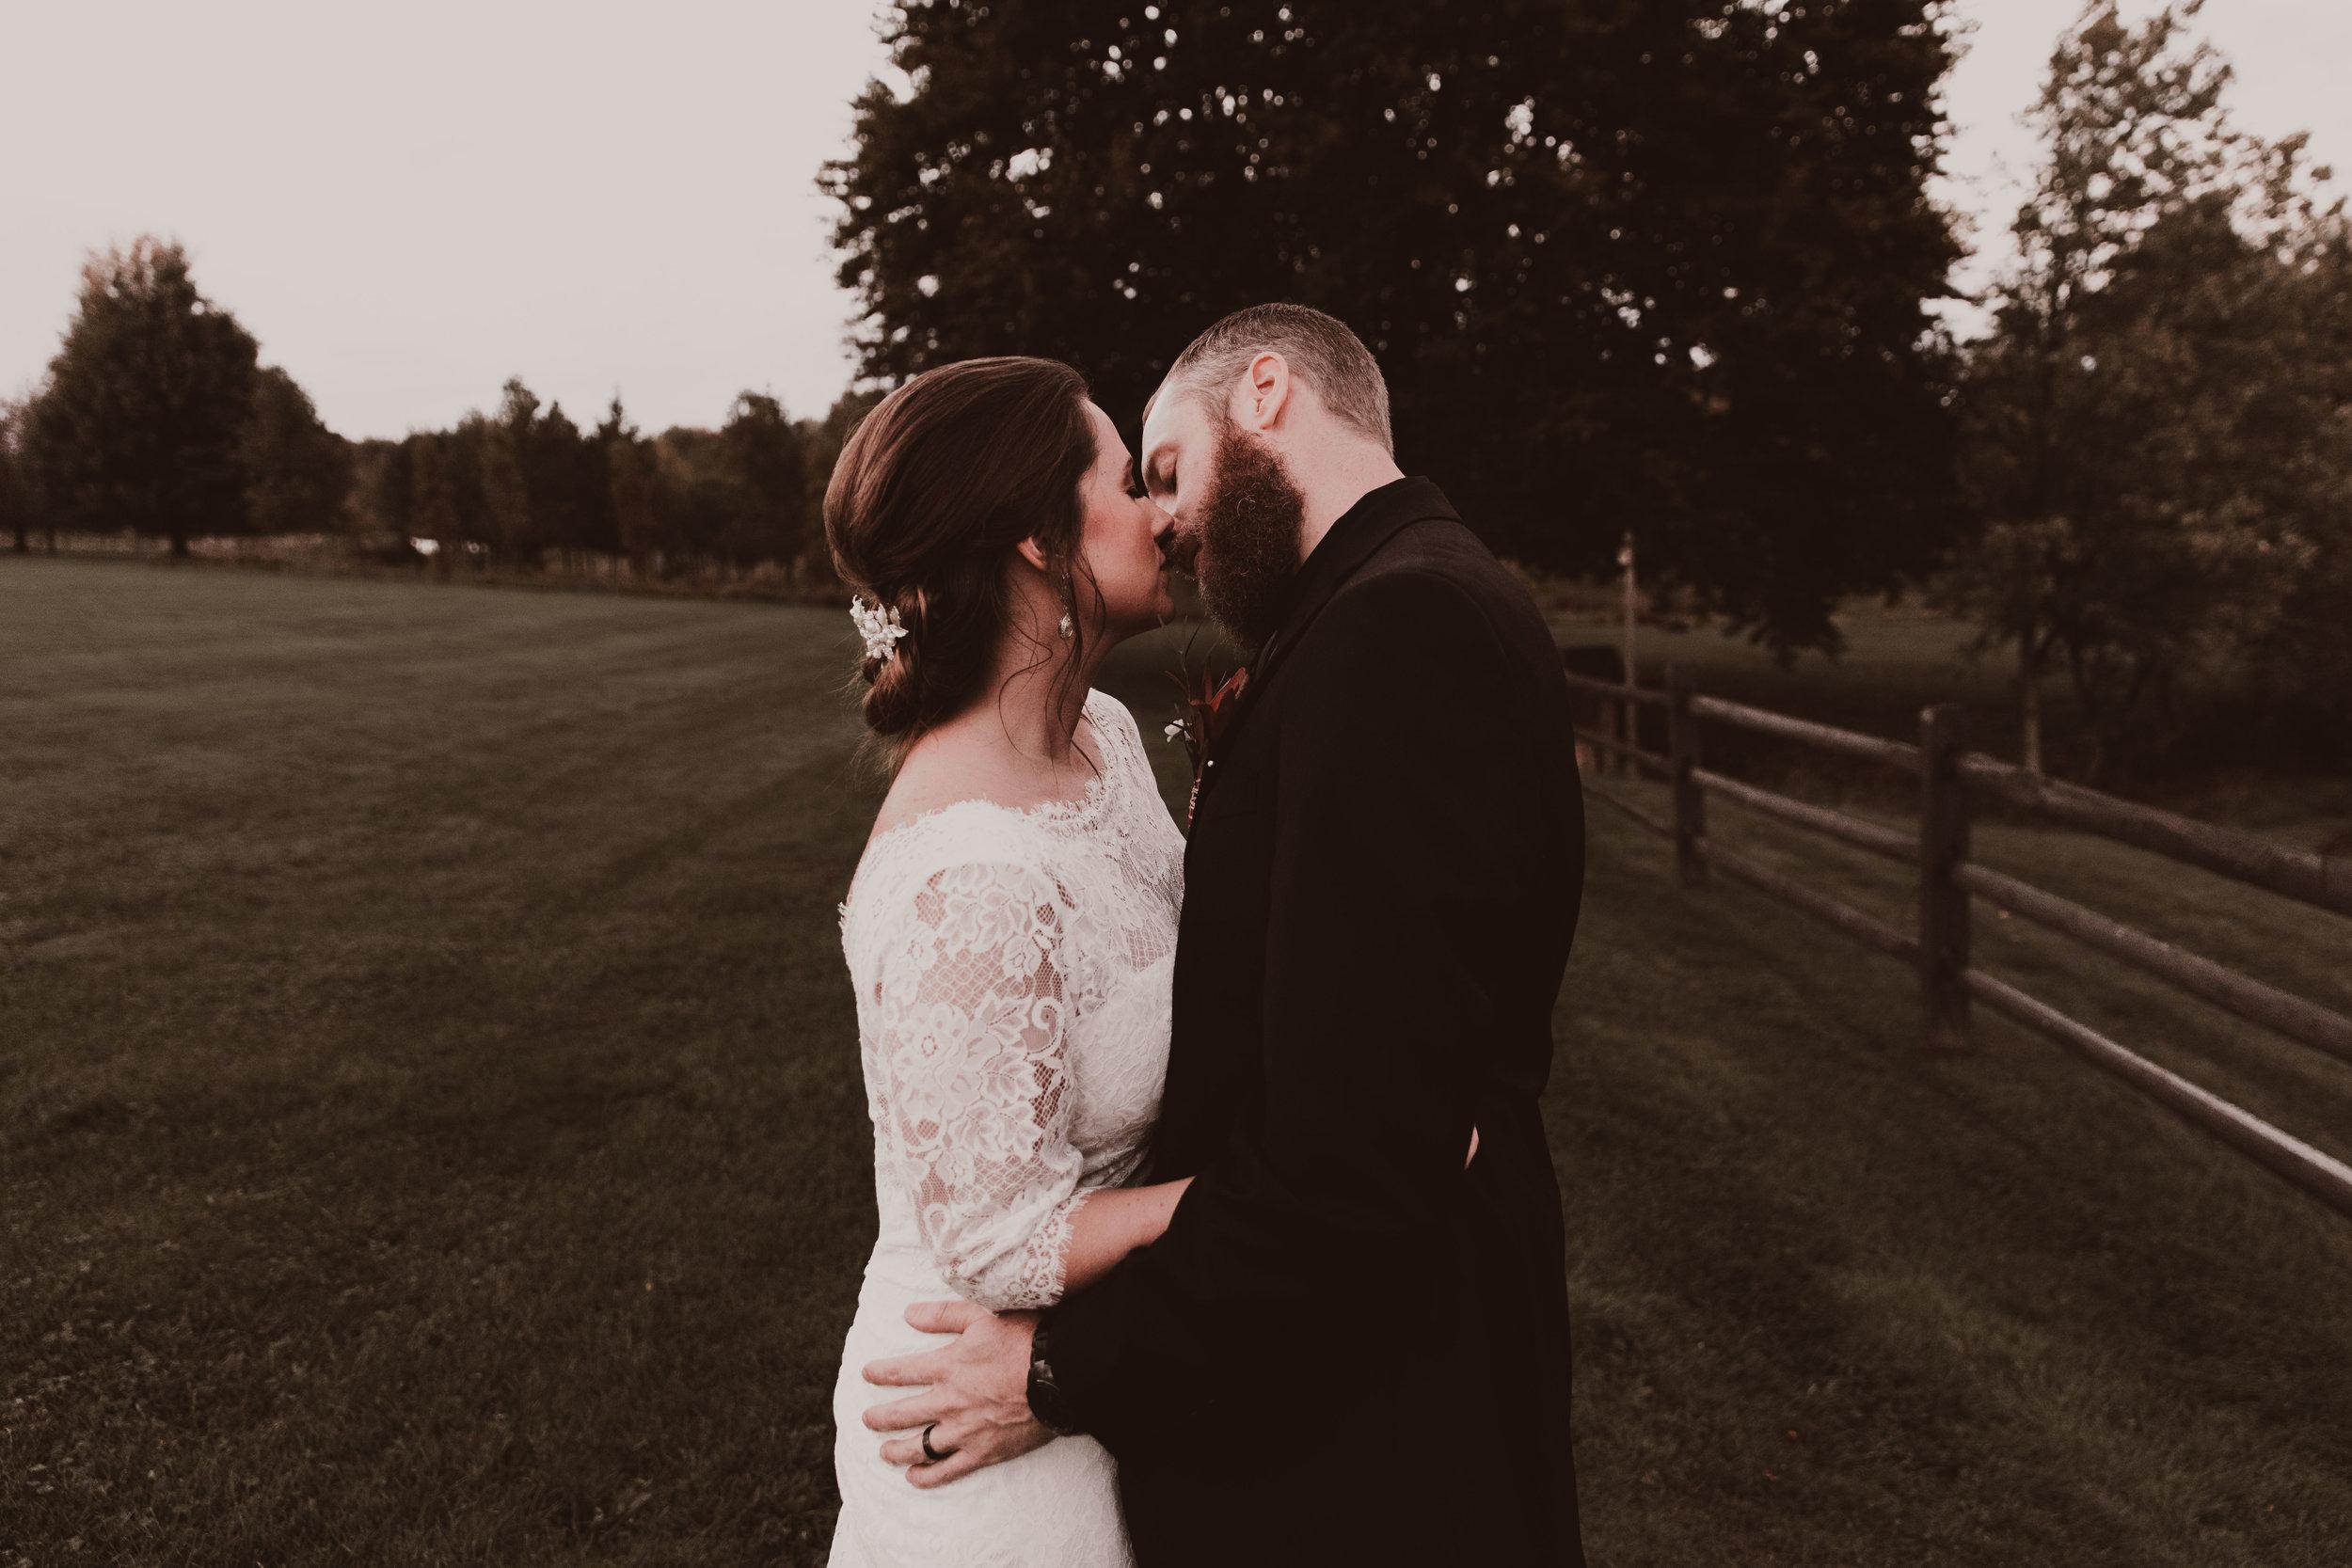 BUTLER, PA WEDDING PHOTOGRAPHER - 5W7A7406.jpg